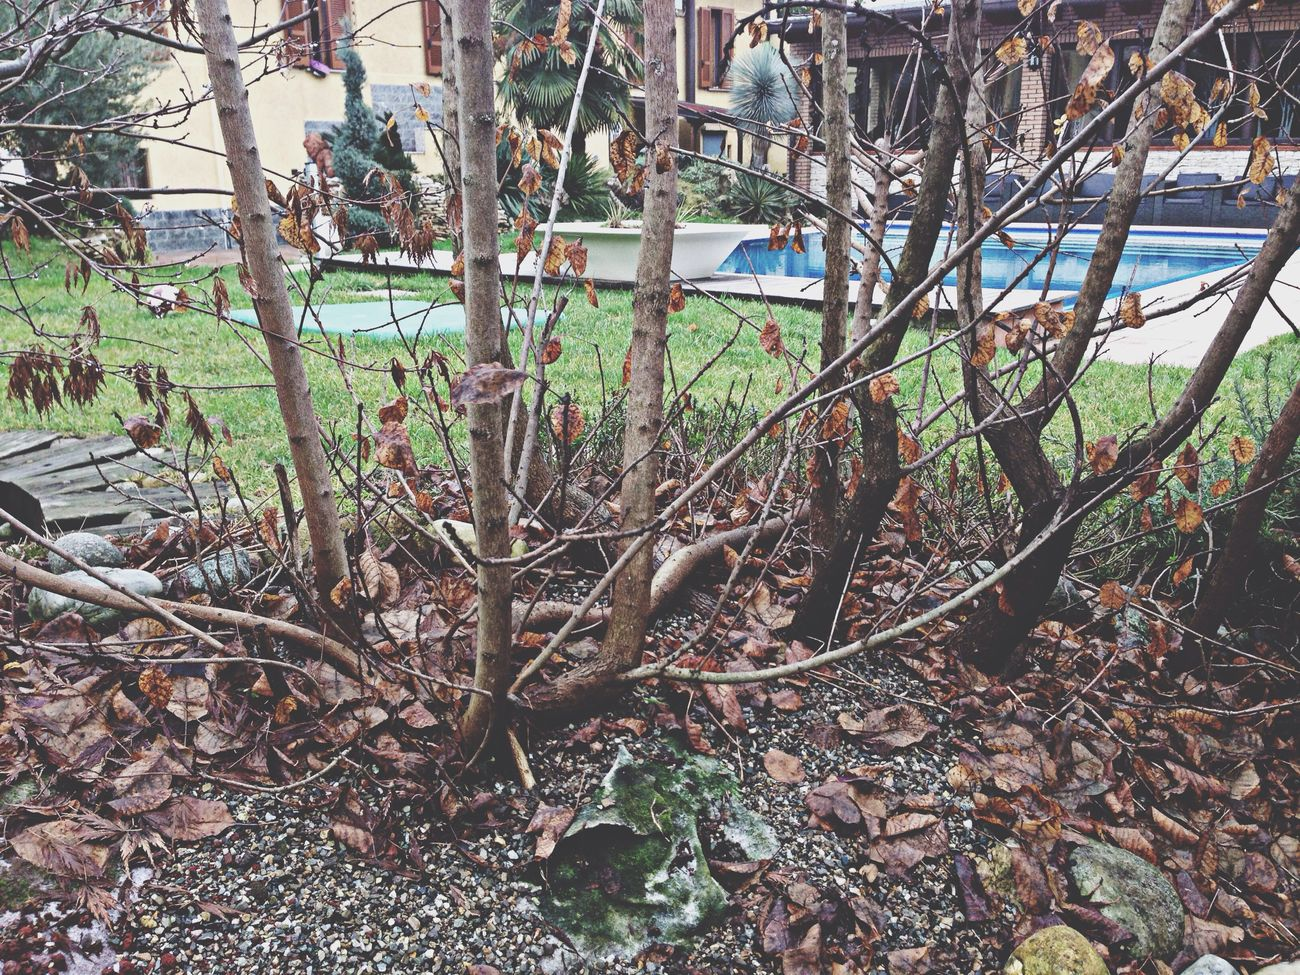 My garden, Milan, Italy My Garden Milan Il Mio Giardino Milano